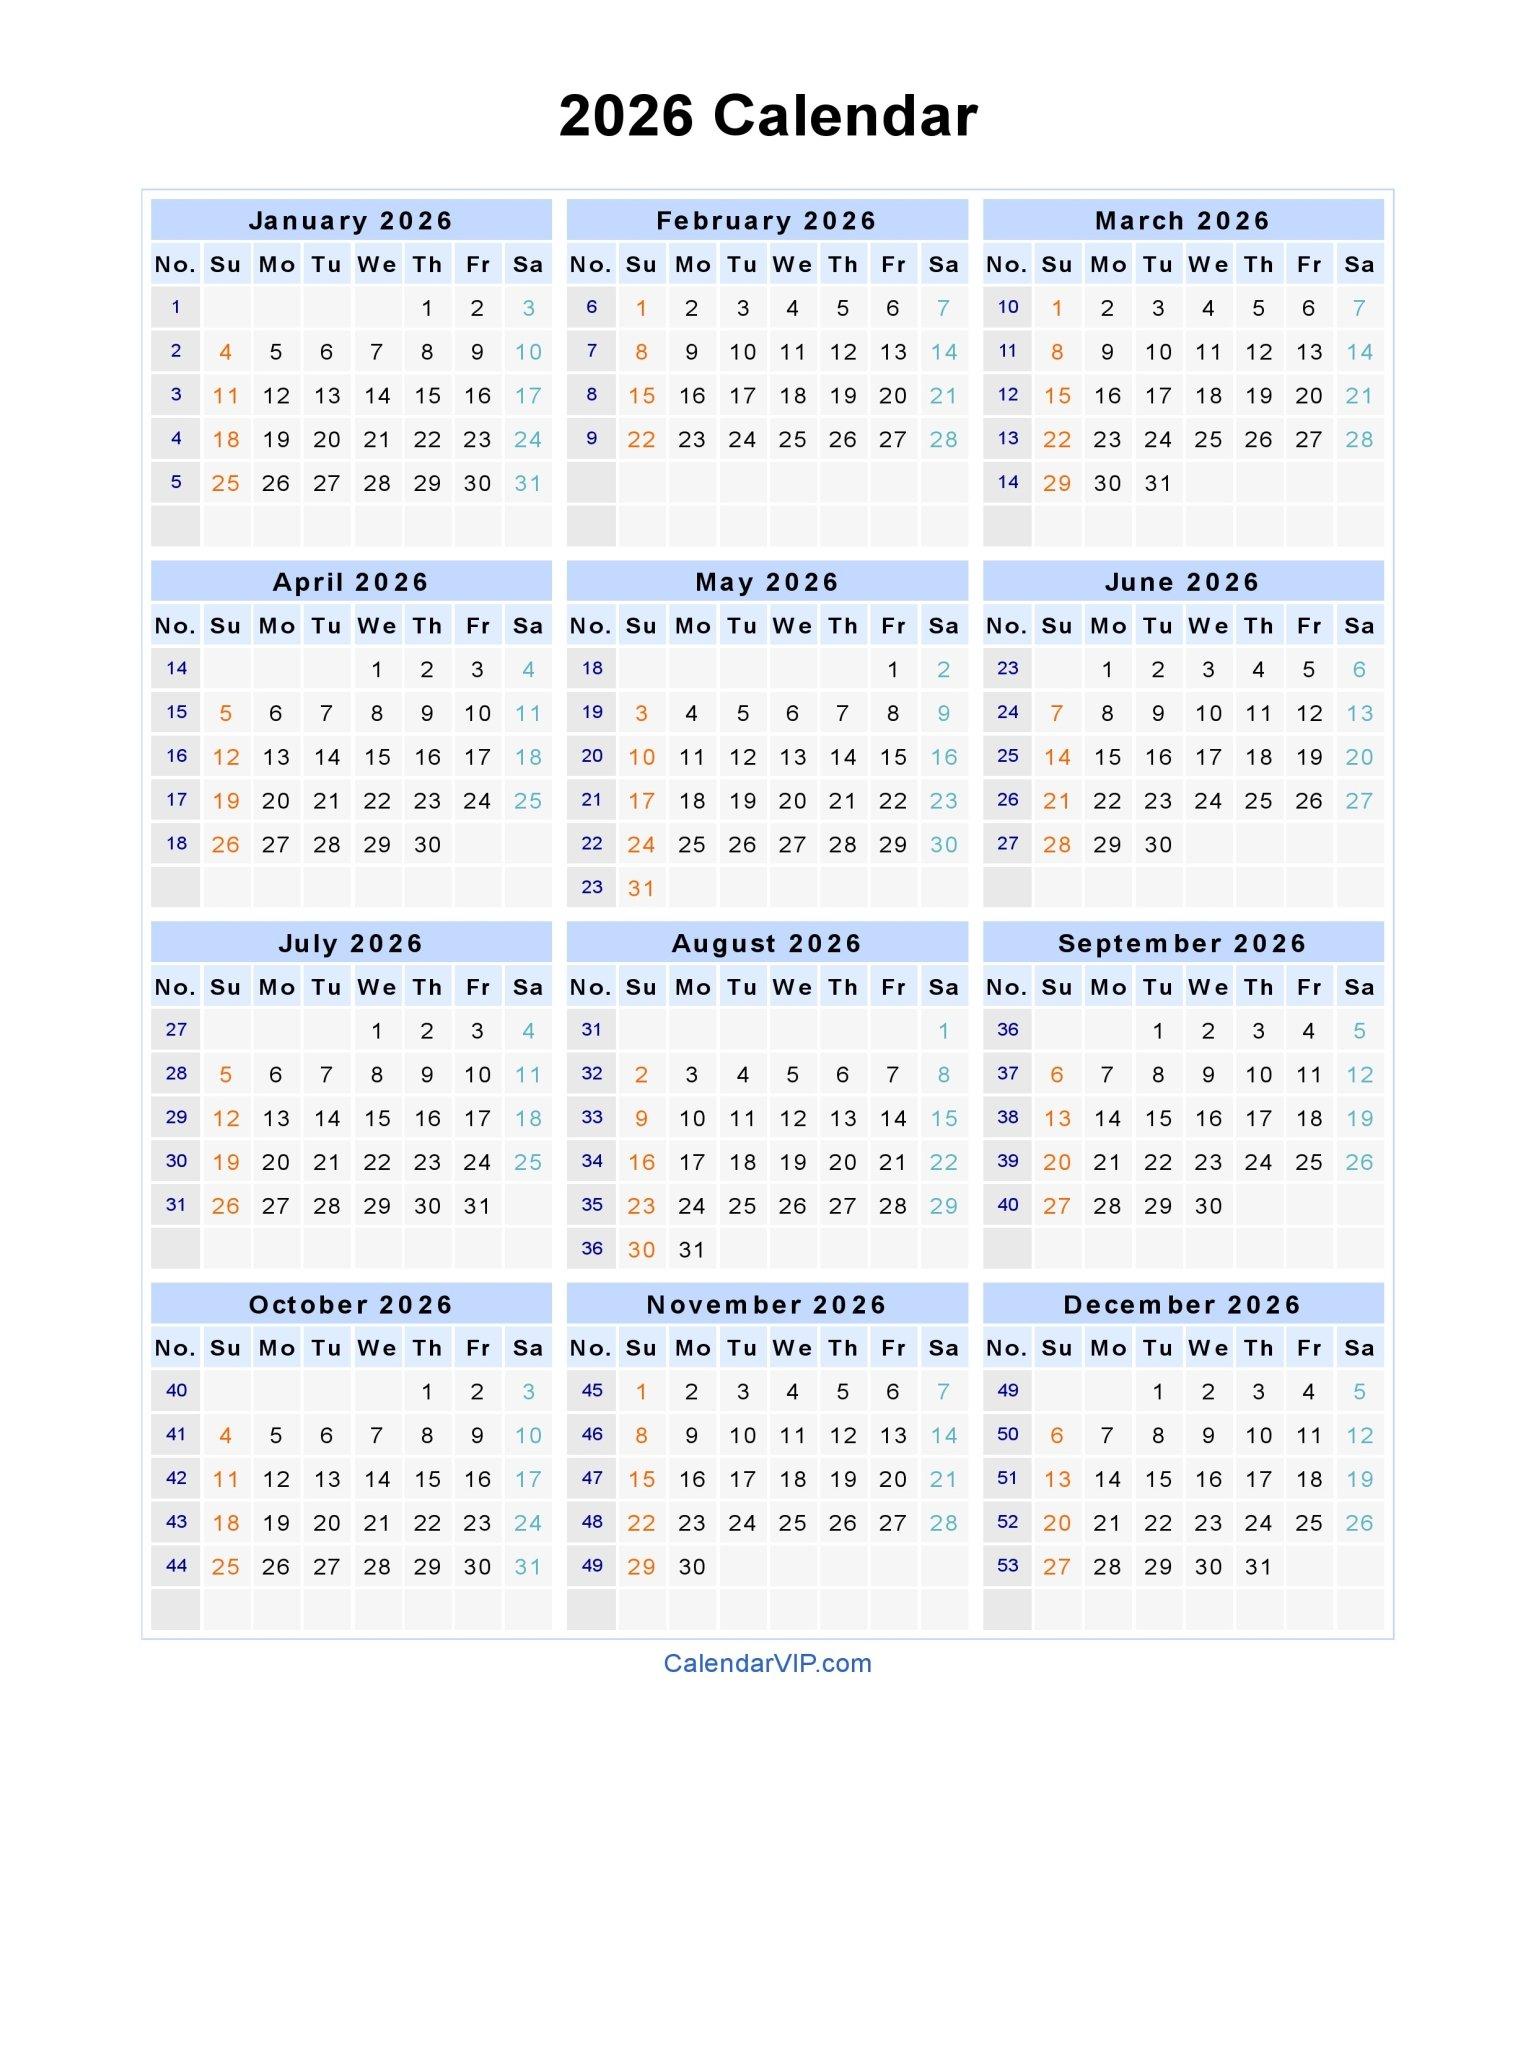 2026 Calendar - Blank Printable Calendar Template In Pdf Blank 30 Day Calendar Starting May 24